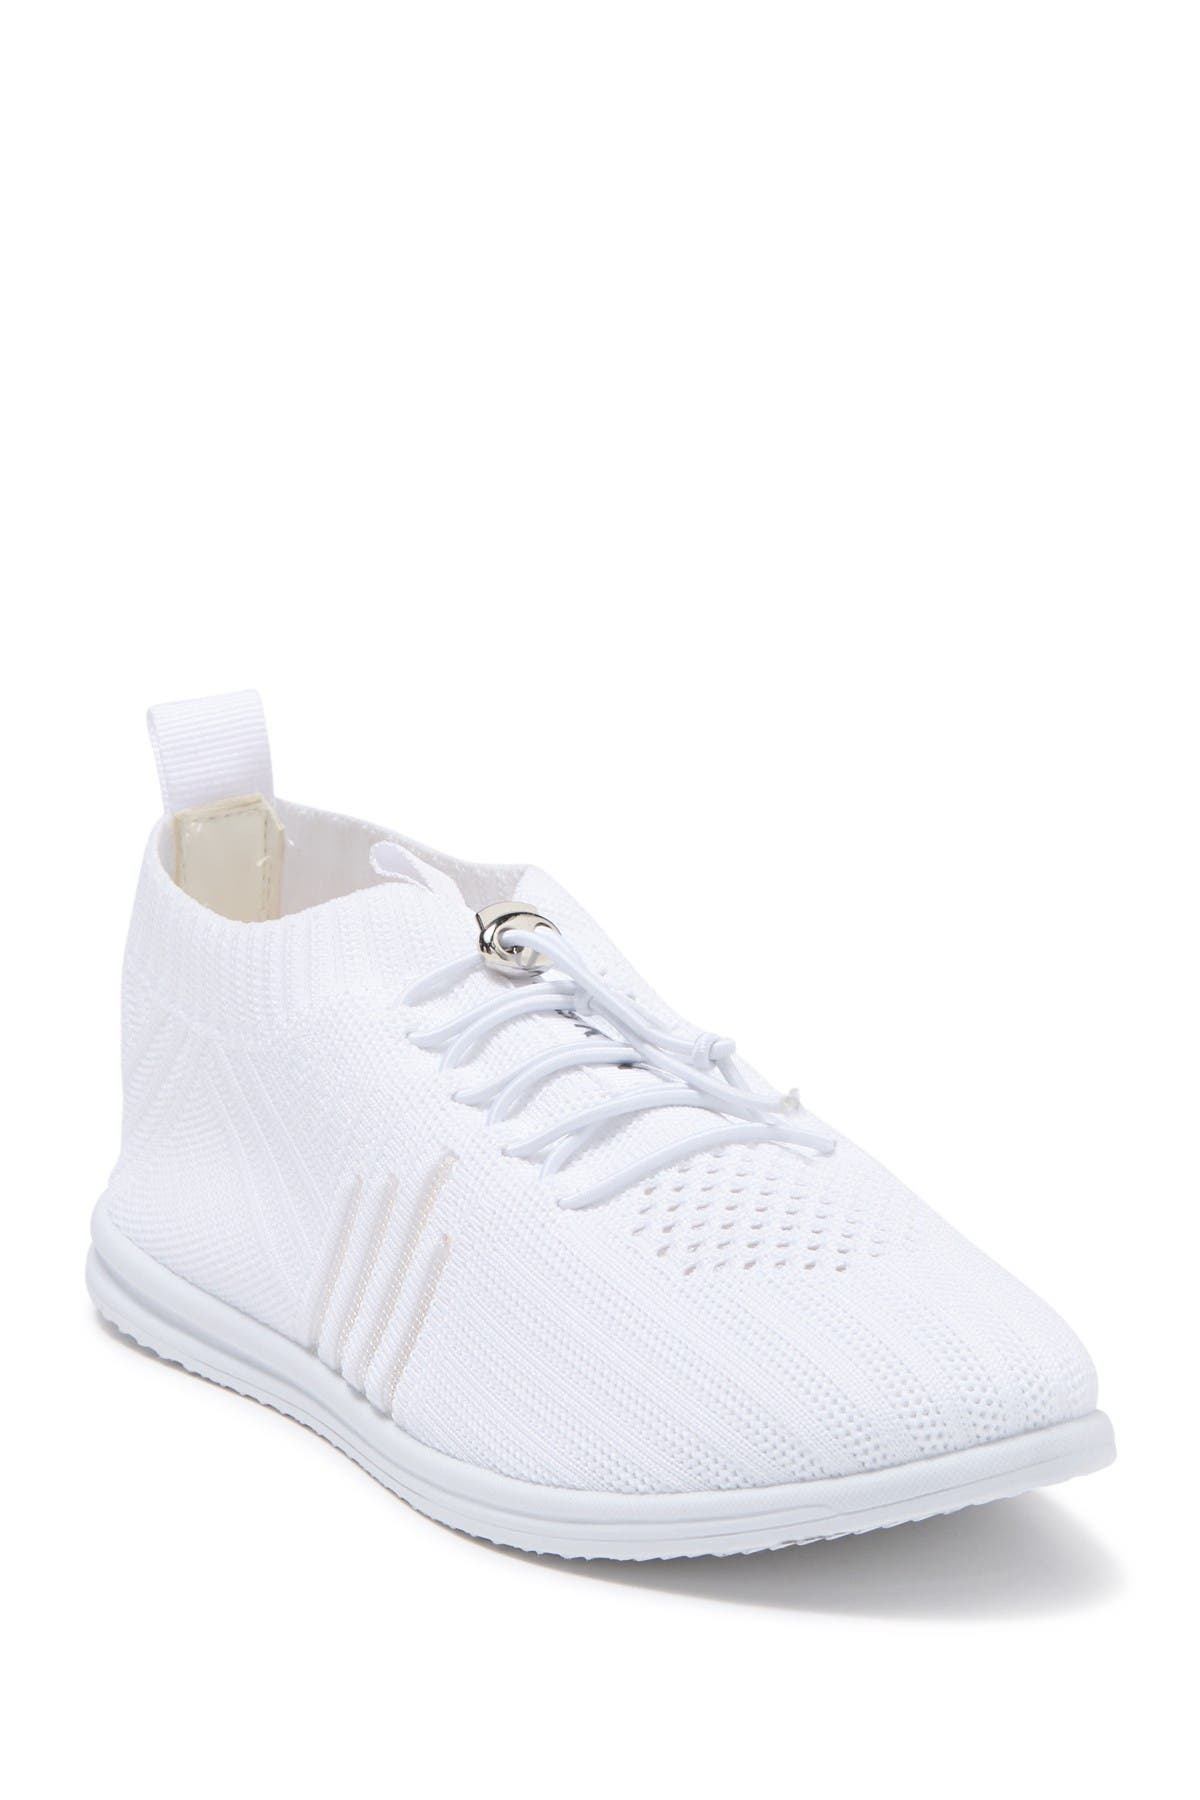 Image of DANSKIN Active Lace Knit Sneaker